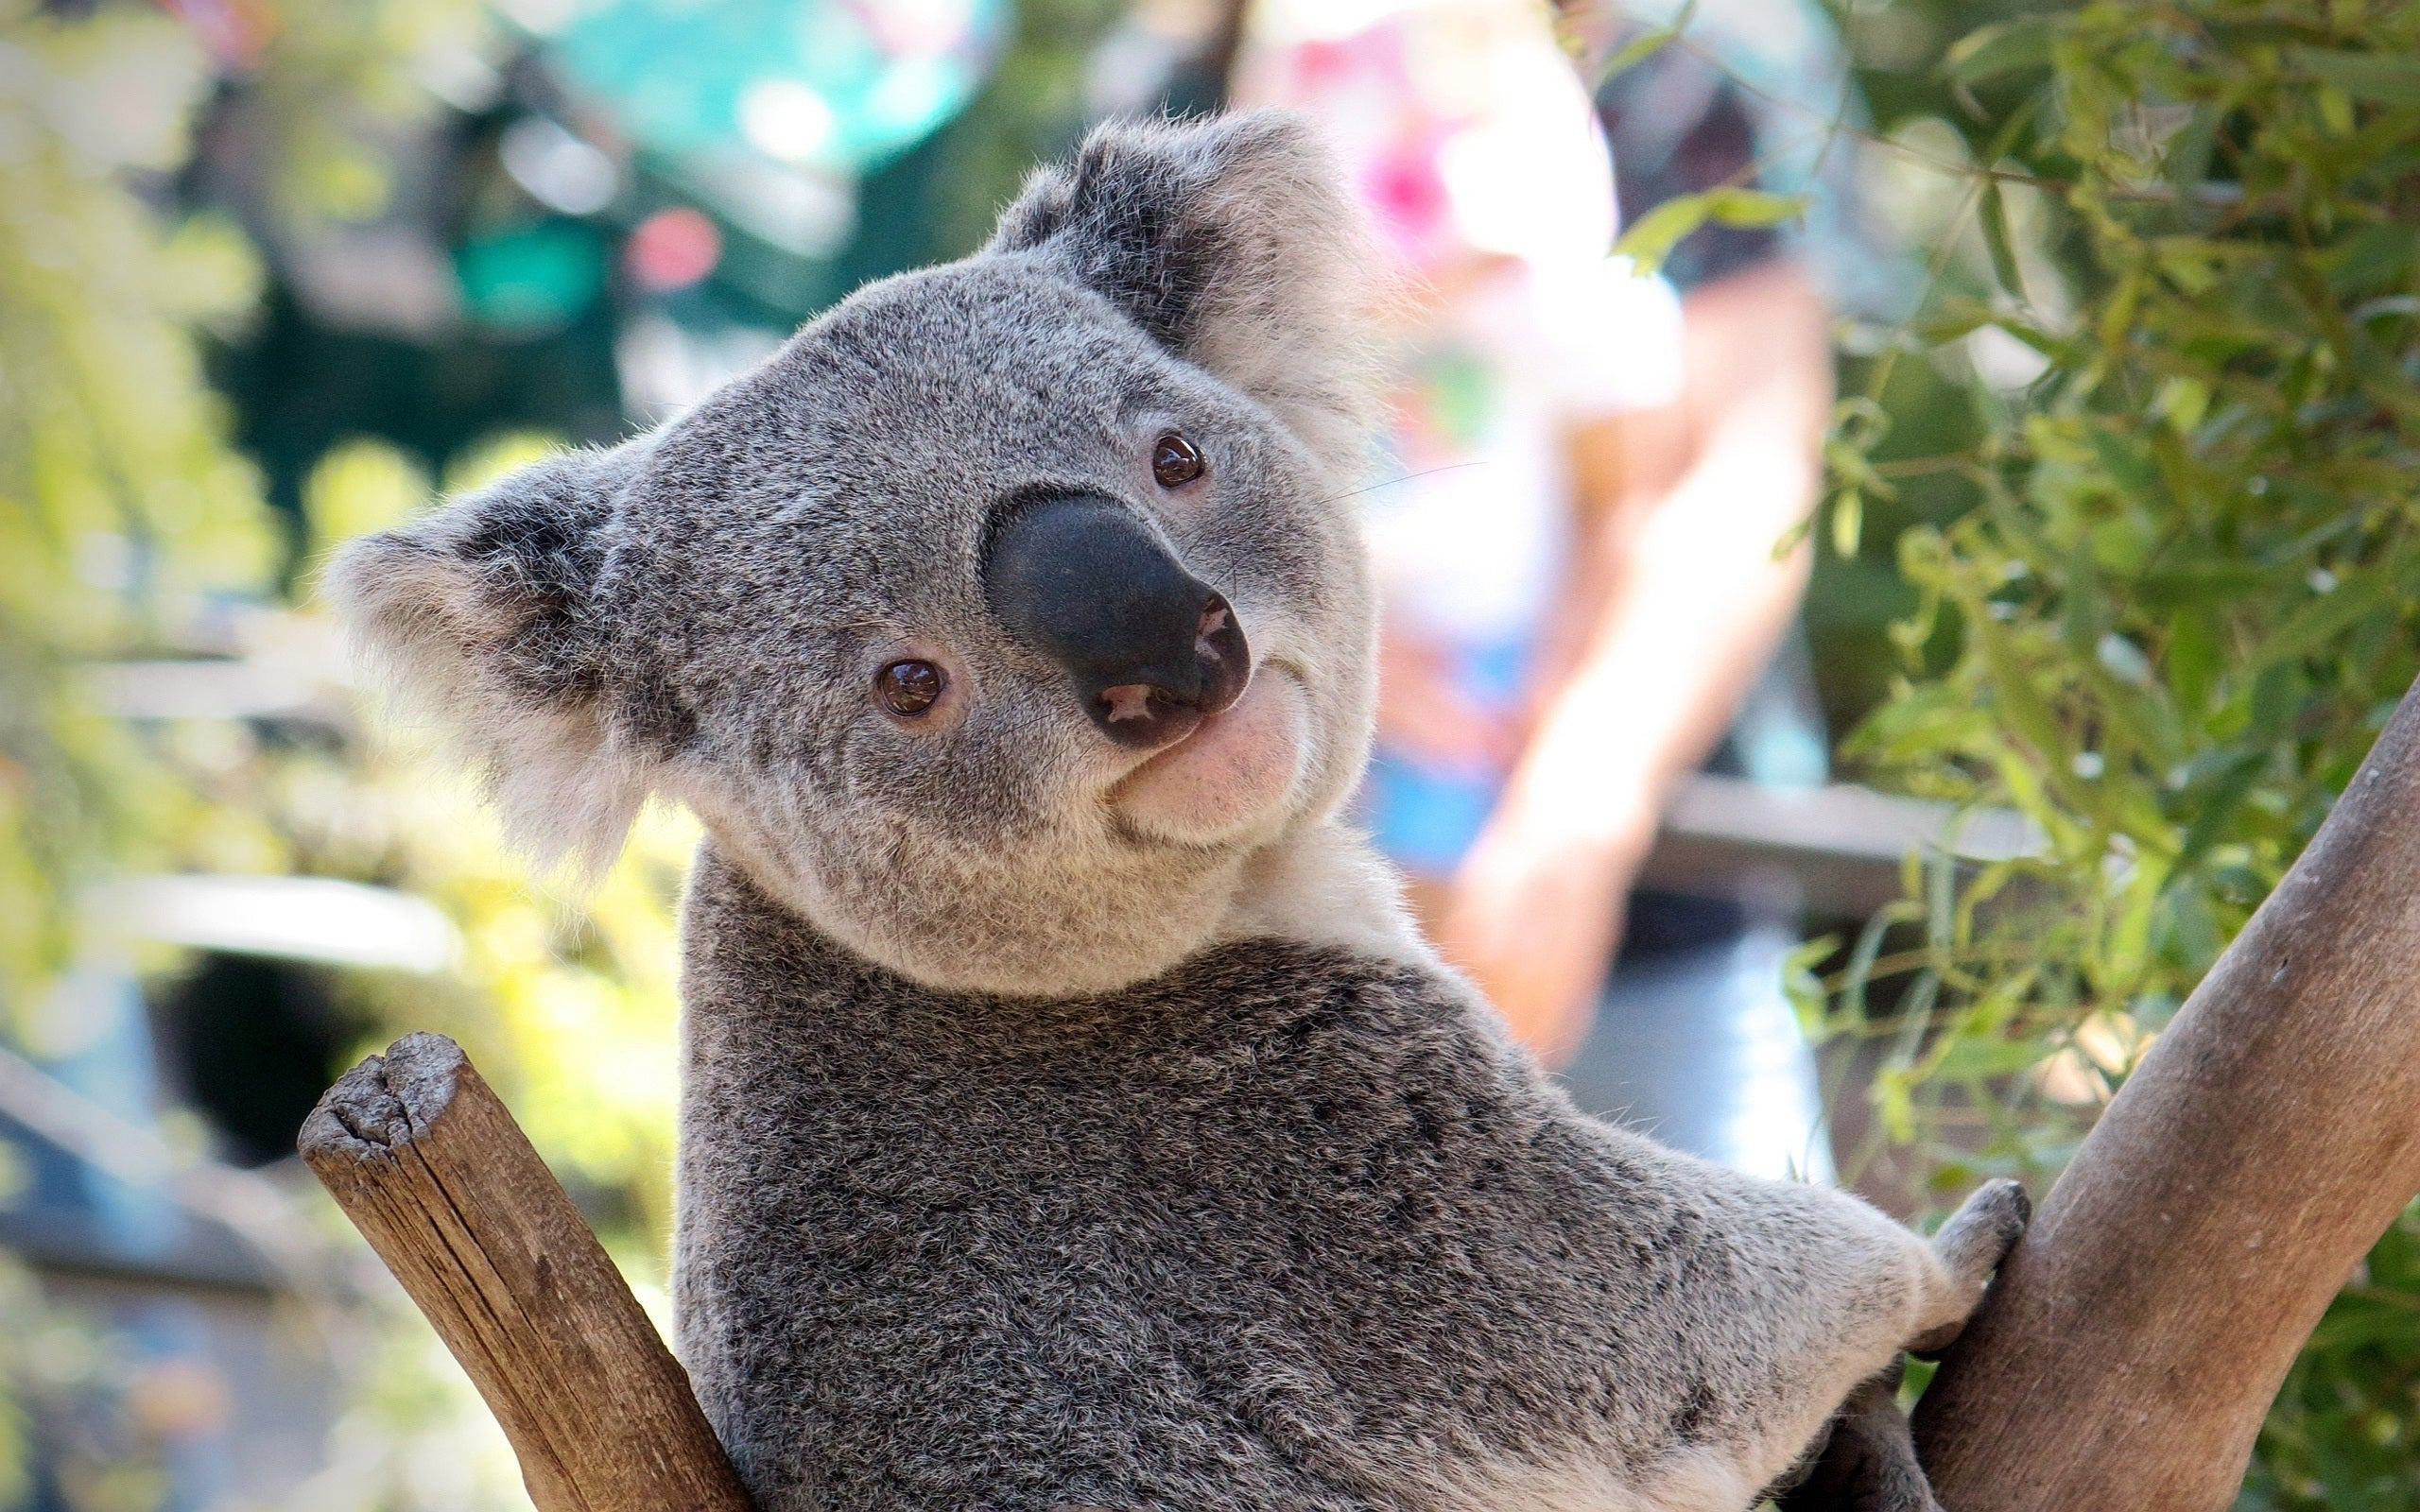 Australian Animals That Won't Kill You, Ranked